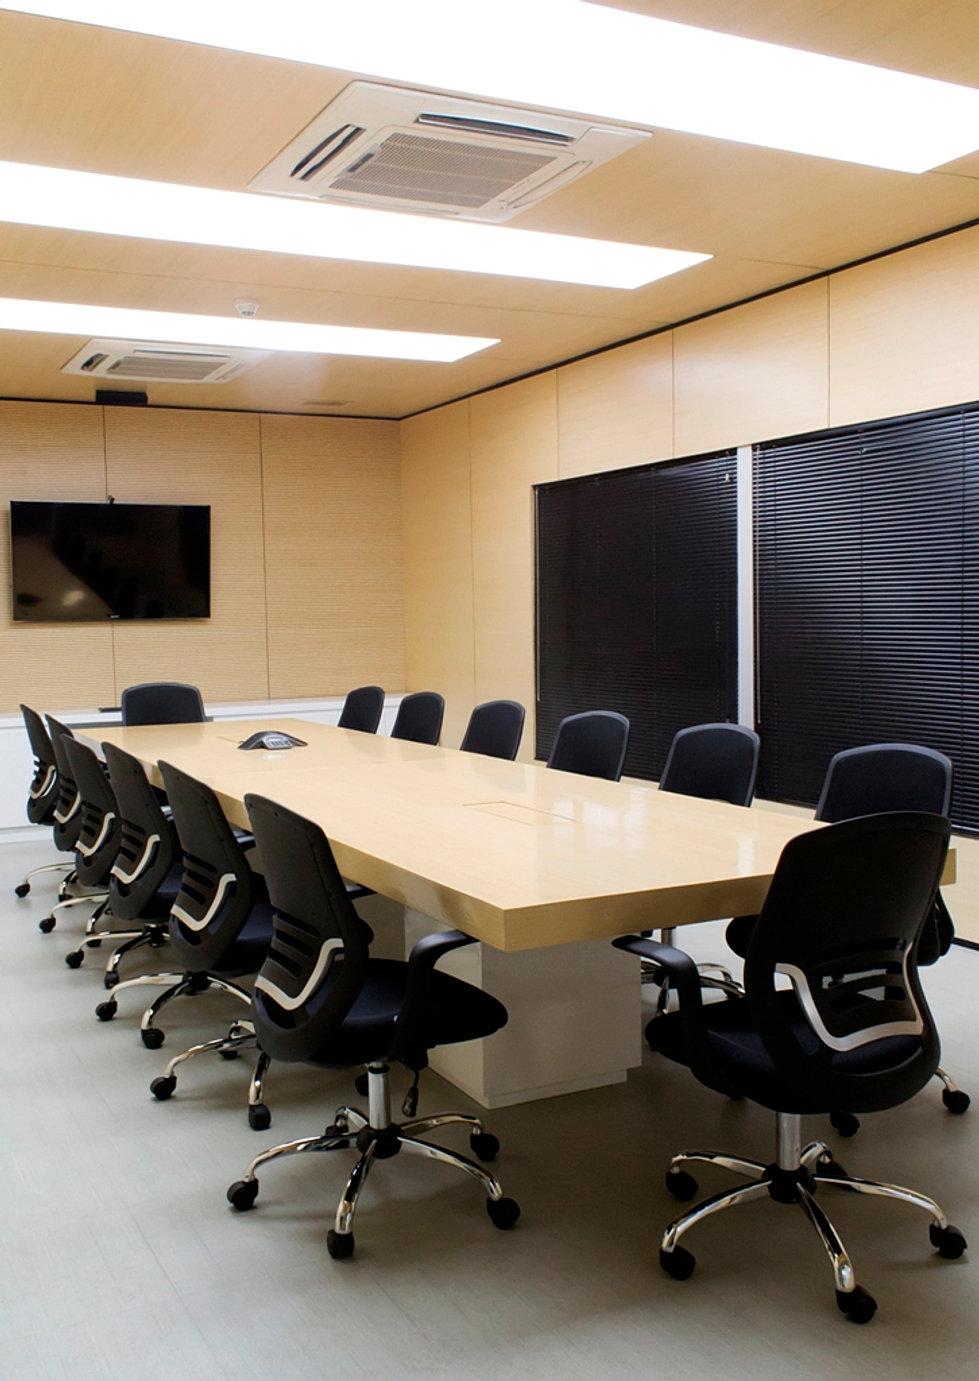 Oficinas caracol televisi n for Gimnasio quirinal